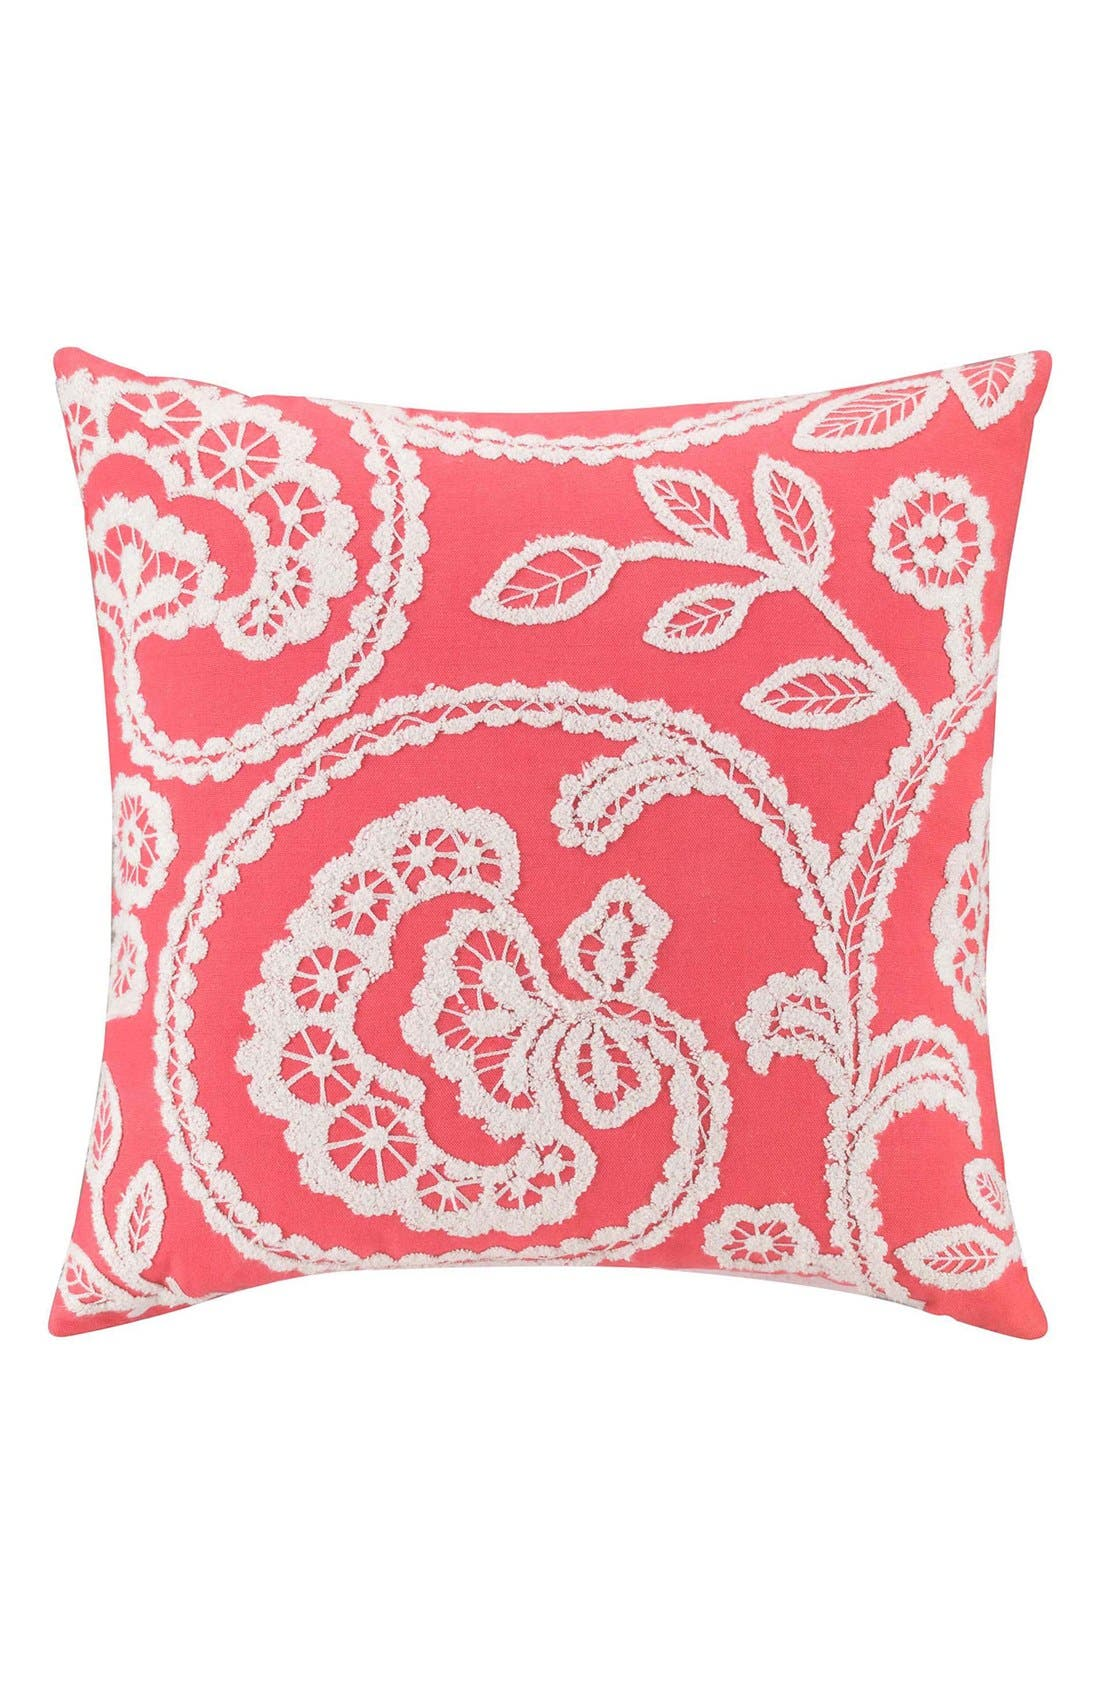 'Ingrid' Pillow,                         Main,                         color, 950